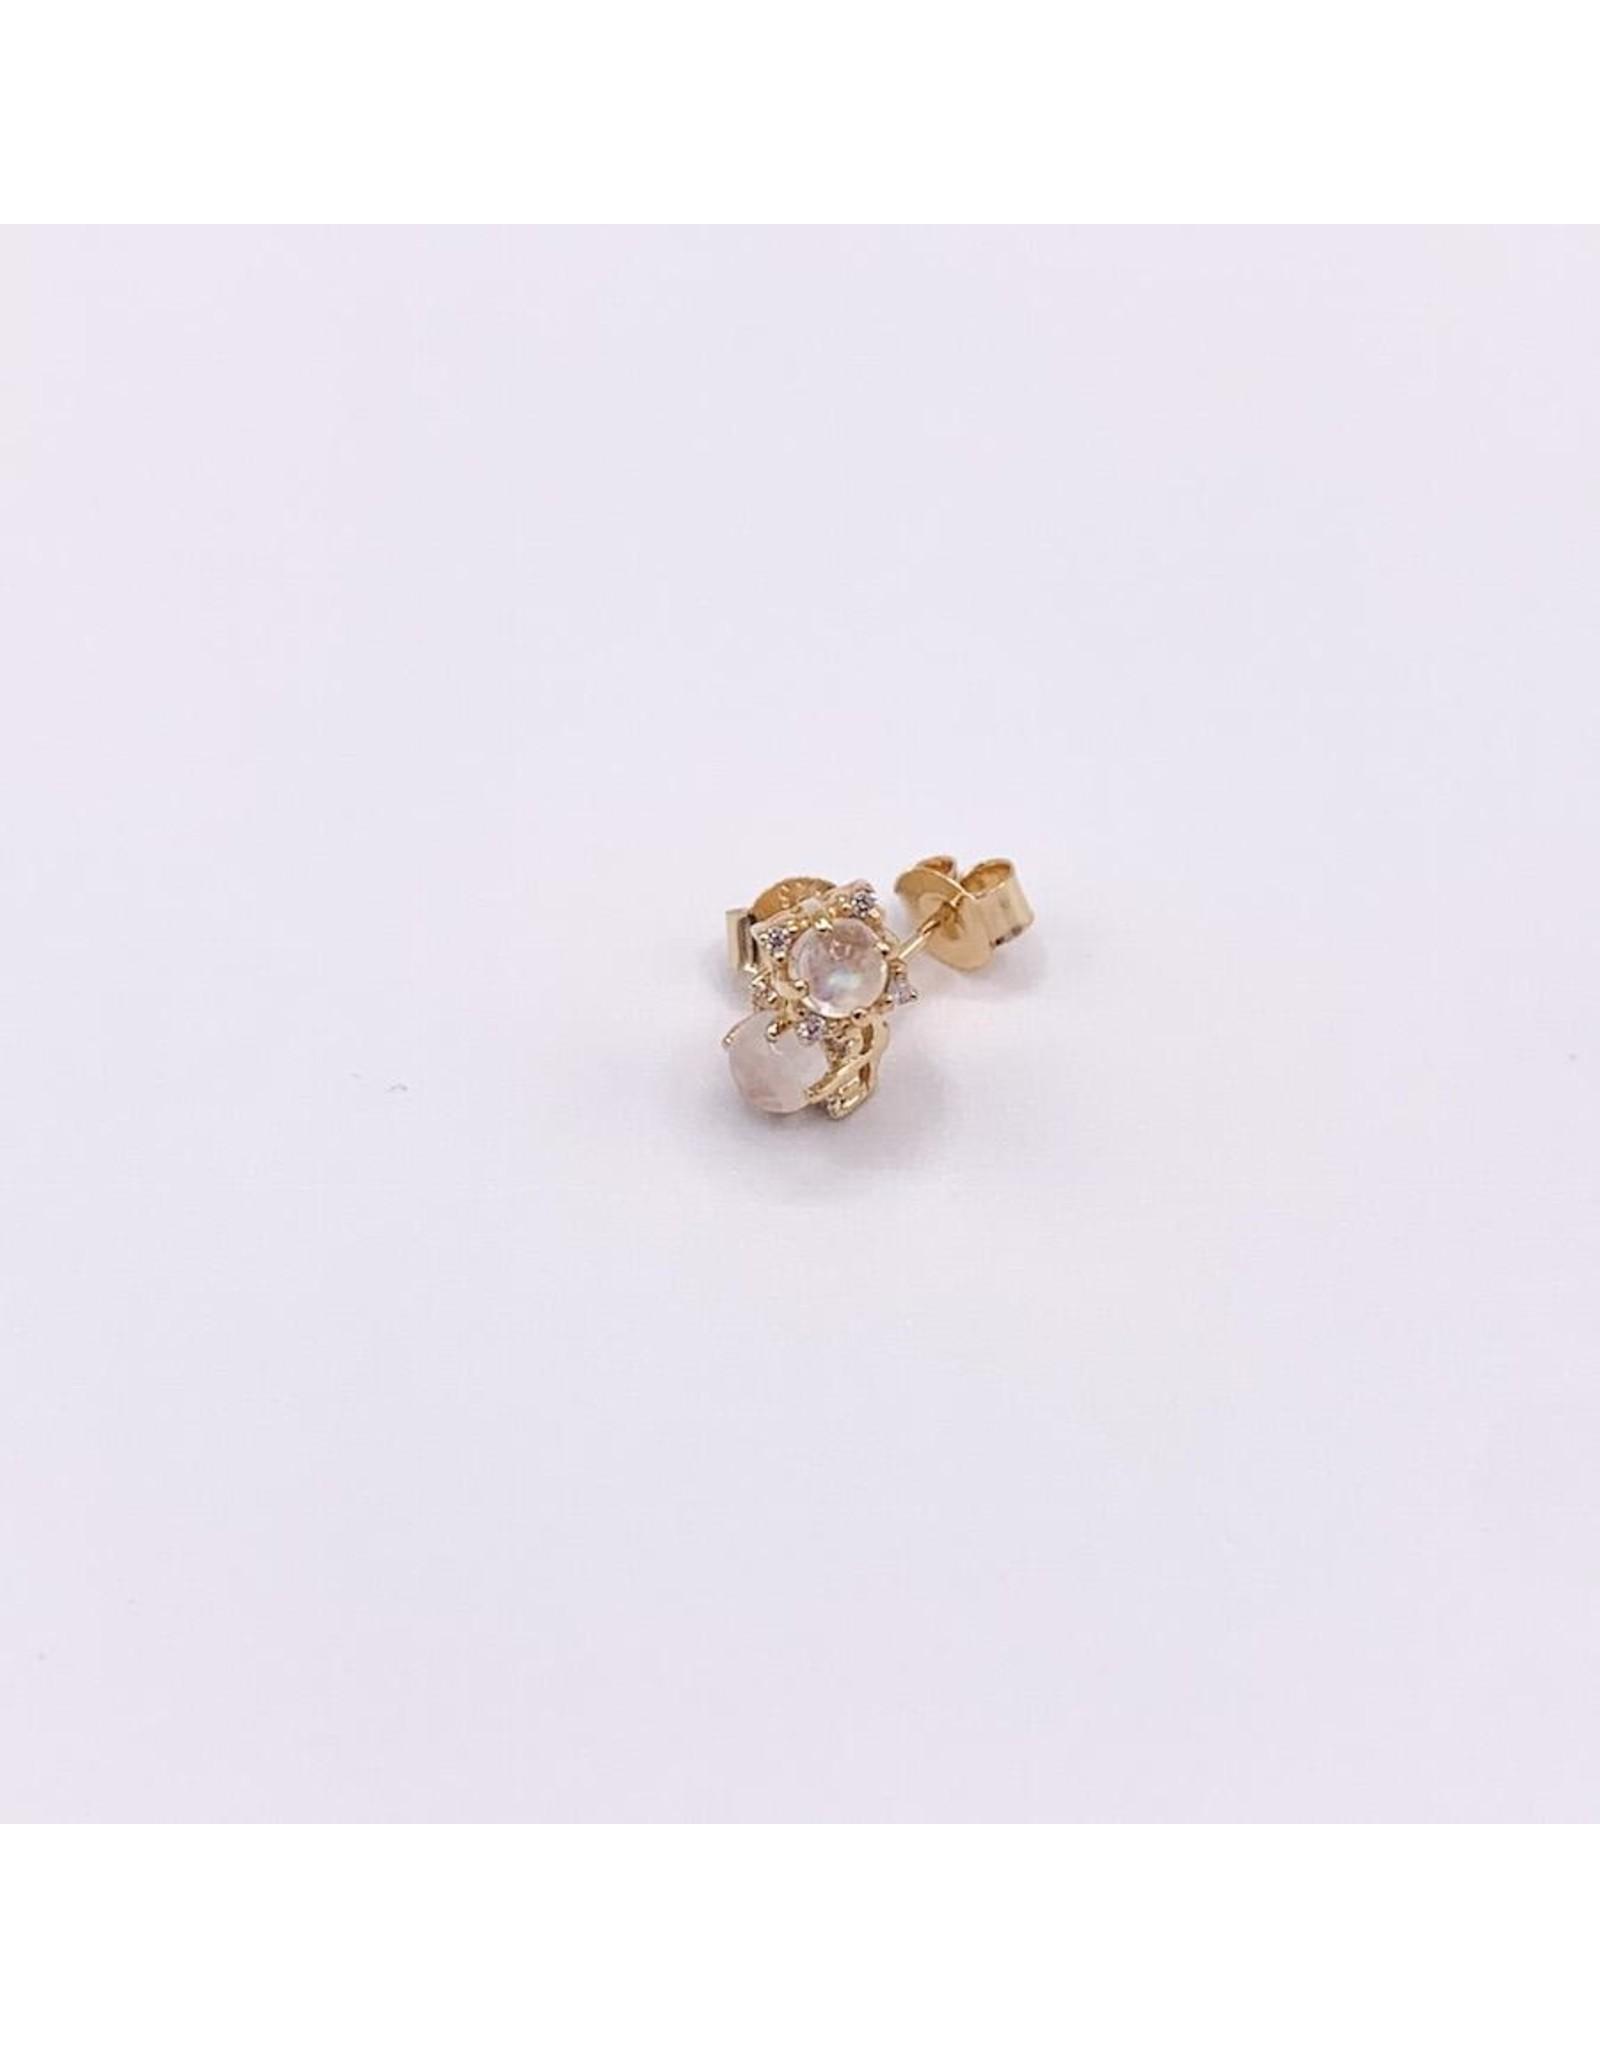 Jewelry By Amanda Gold Audra Earrings